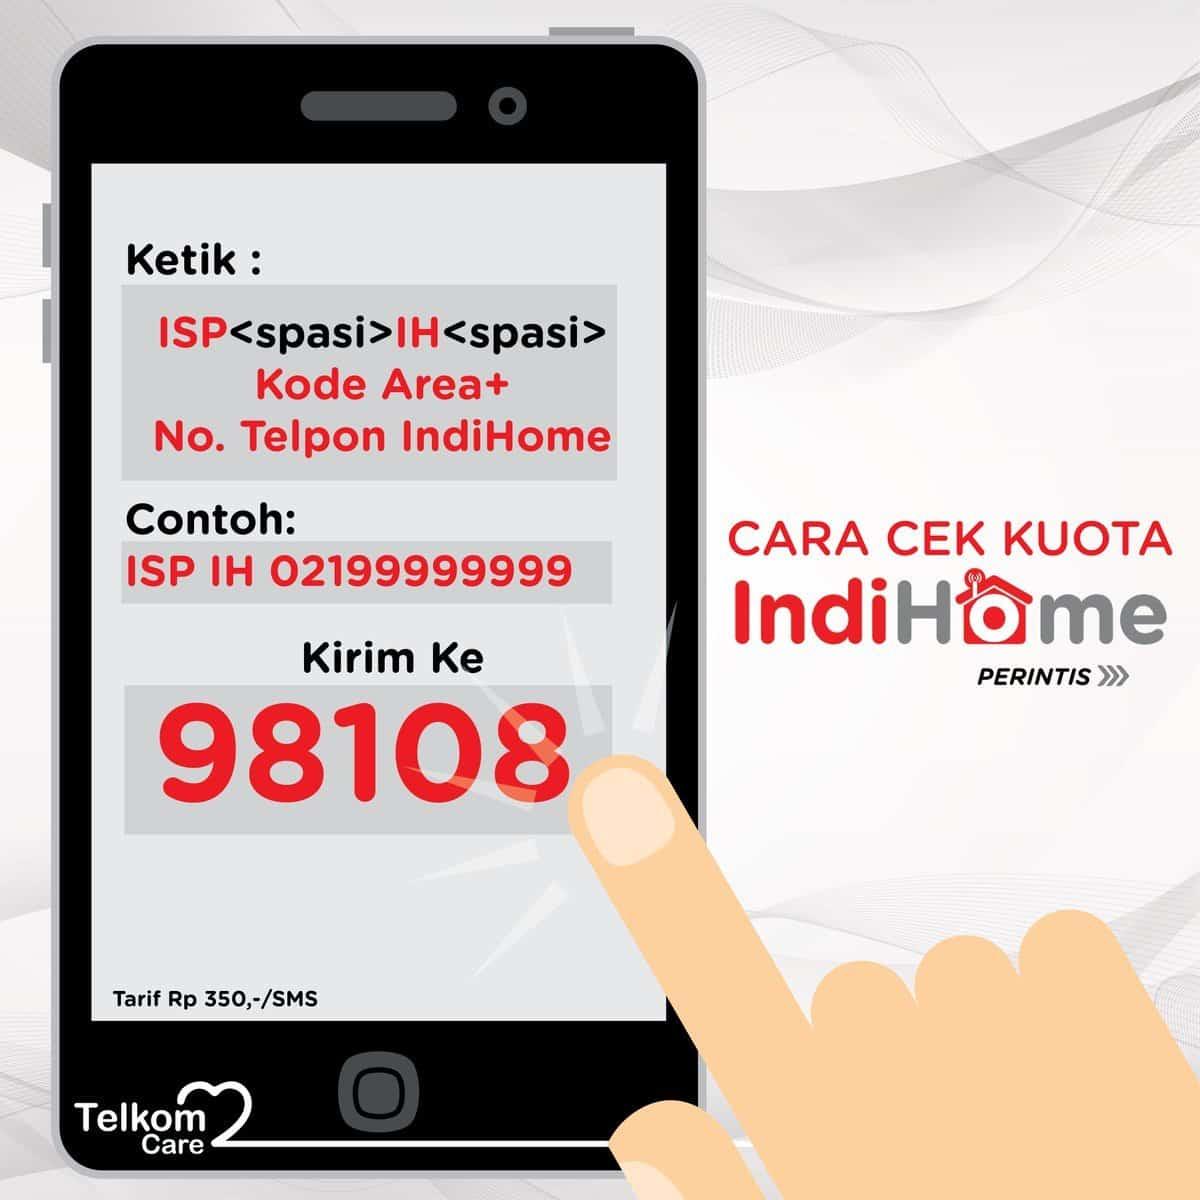 Cek-Kuota-Indihome-Lewat-SMS